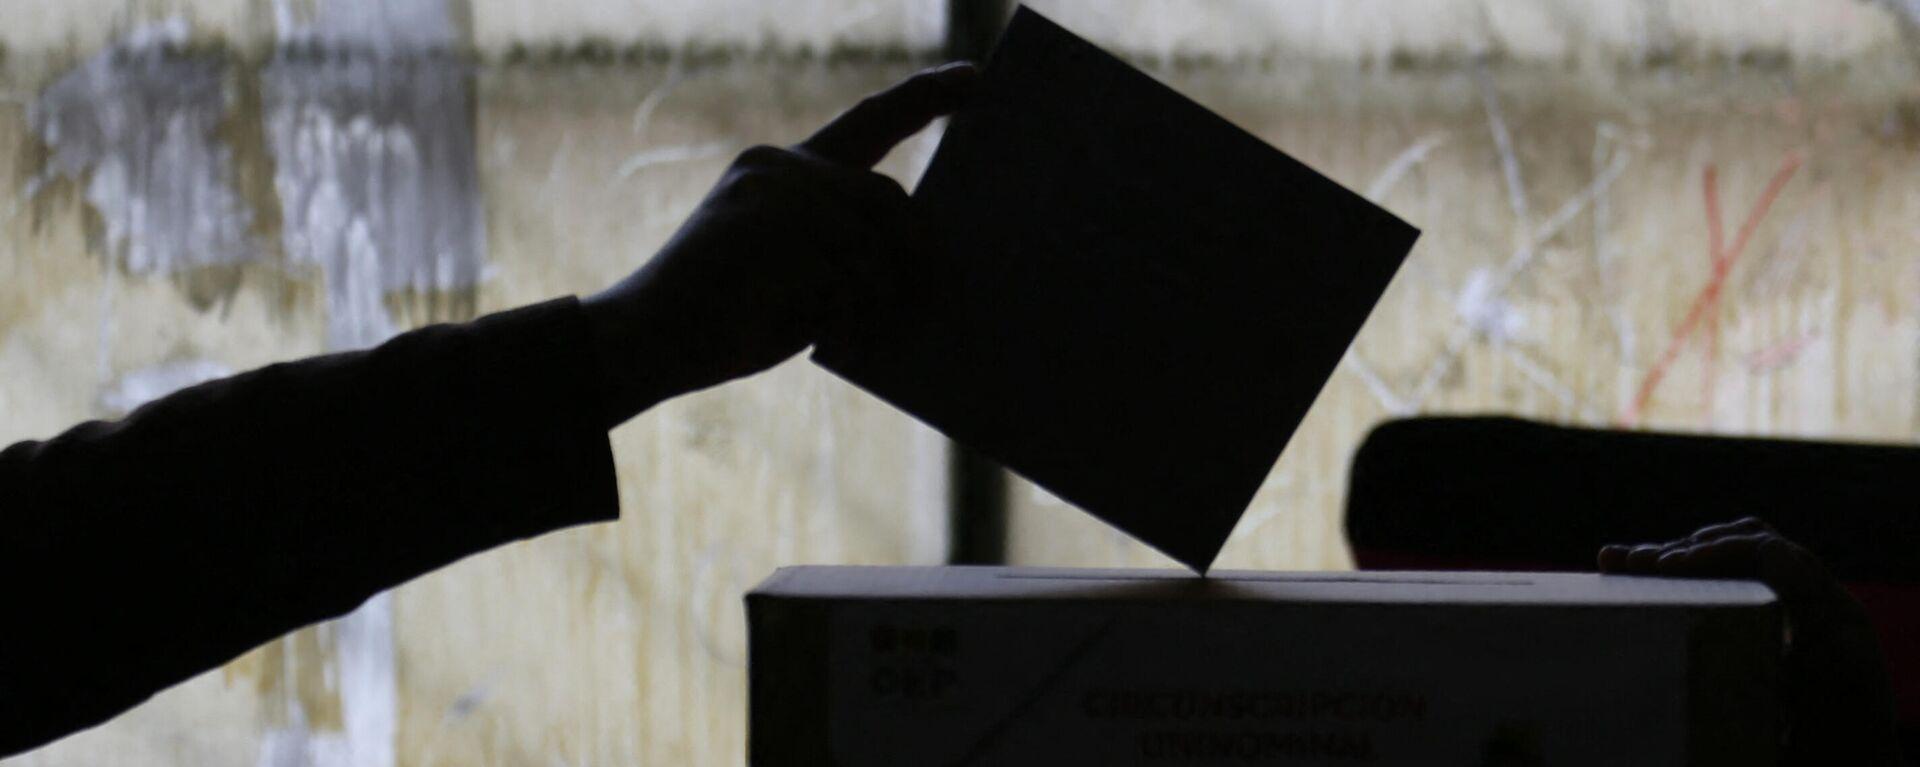 Elecciones en Bolivia - Sputnik Mundo, 1920, 05.03.2021